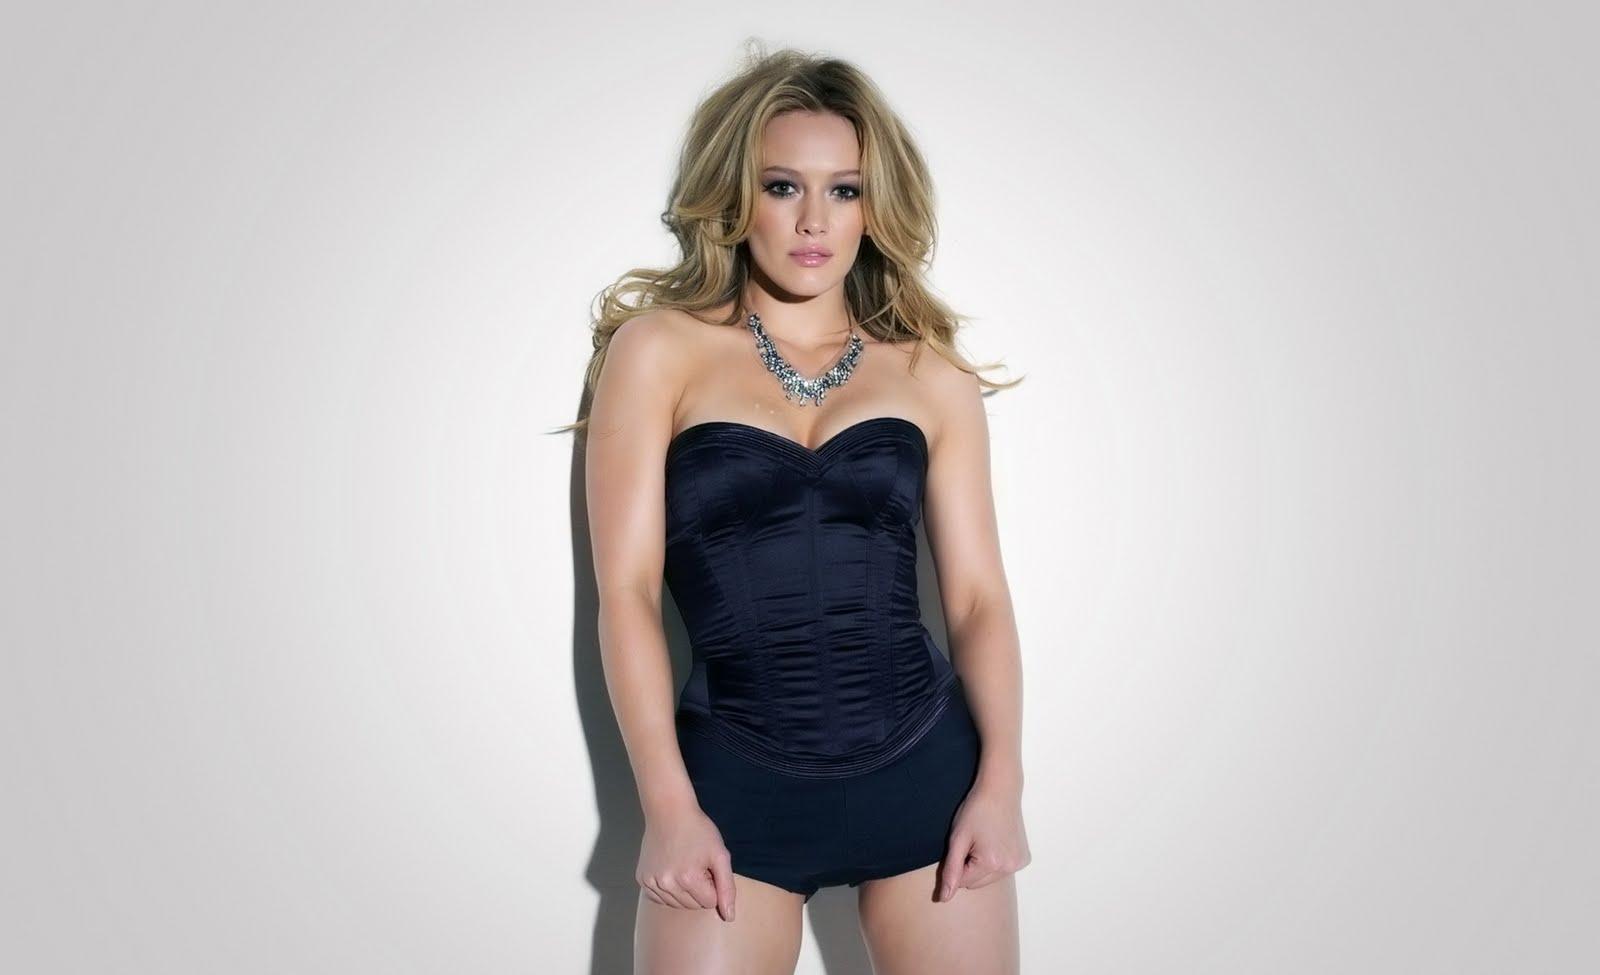 http://4.bp.blogspot.com/-EovhKlviJZ8/TprKghe5ARI/AAAAAAAAGJM/Oyu4v-gBFUQ/s1600/Hilary-Duff%2B%252836%2529.jpg